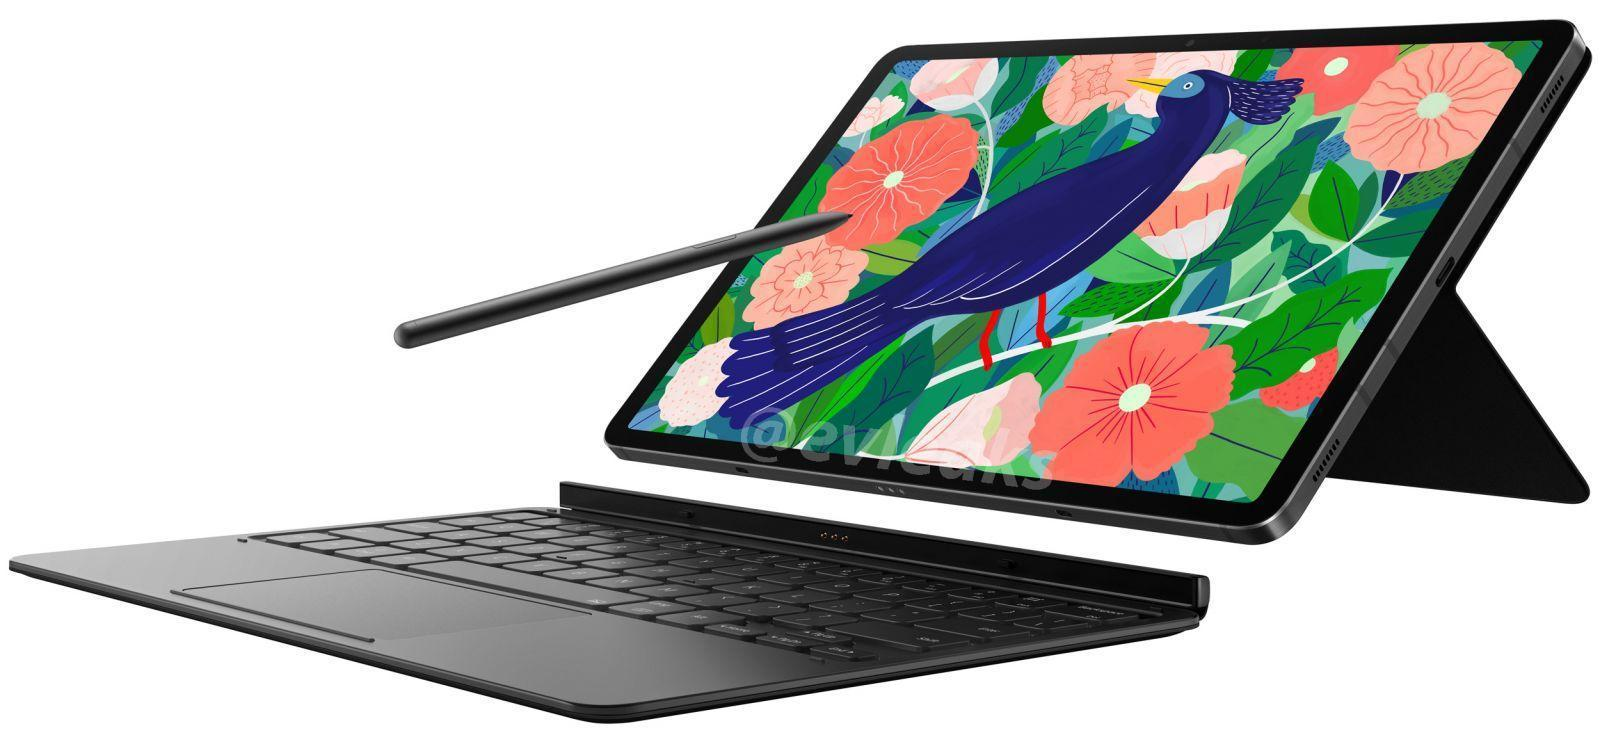 В сеть утекли изображения планшета Samsung Galaxy Tab S7 (samsung galaxy tab s7 with s pen and keyboard cover large)